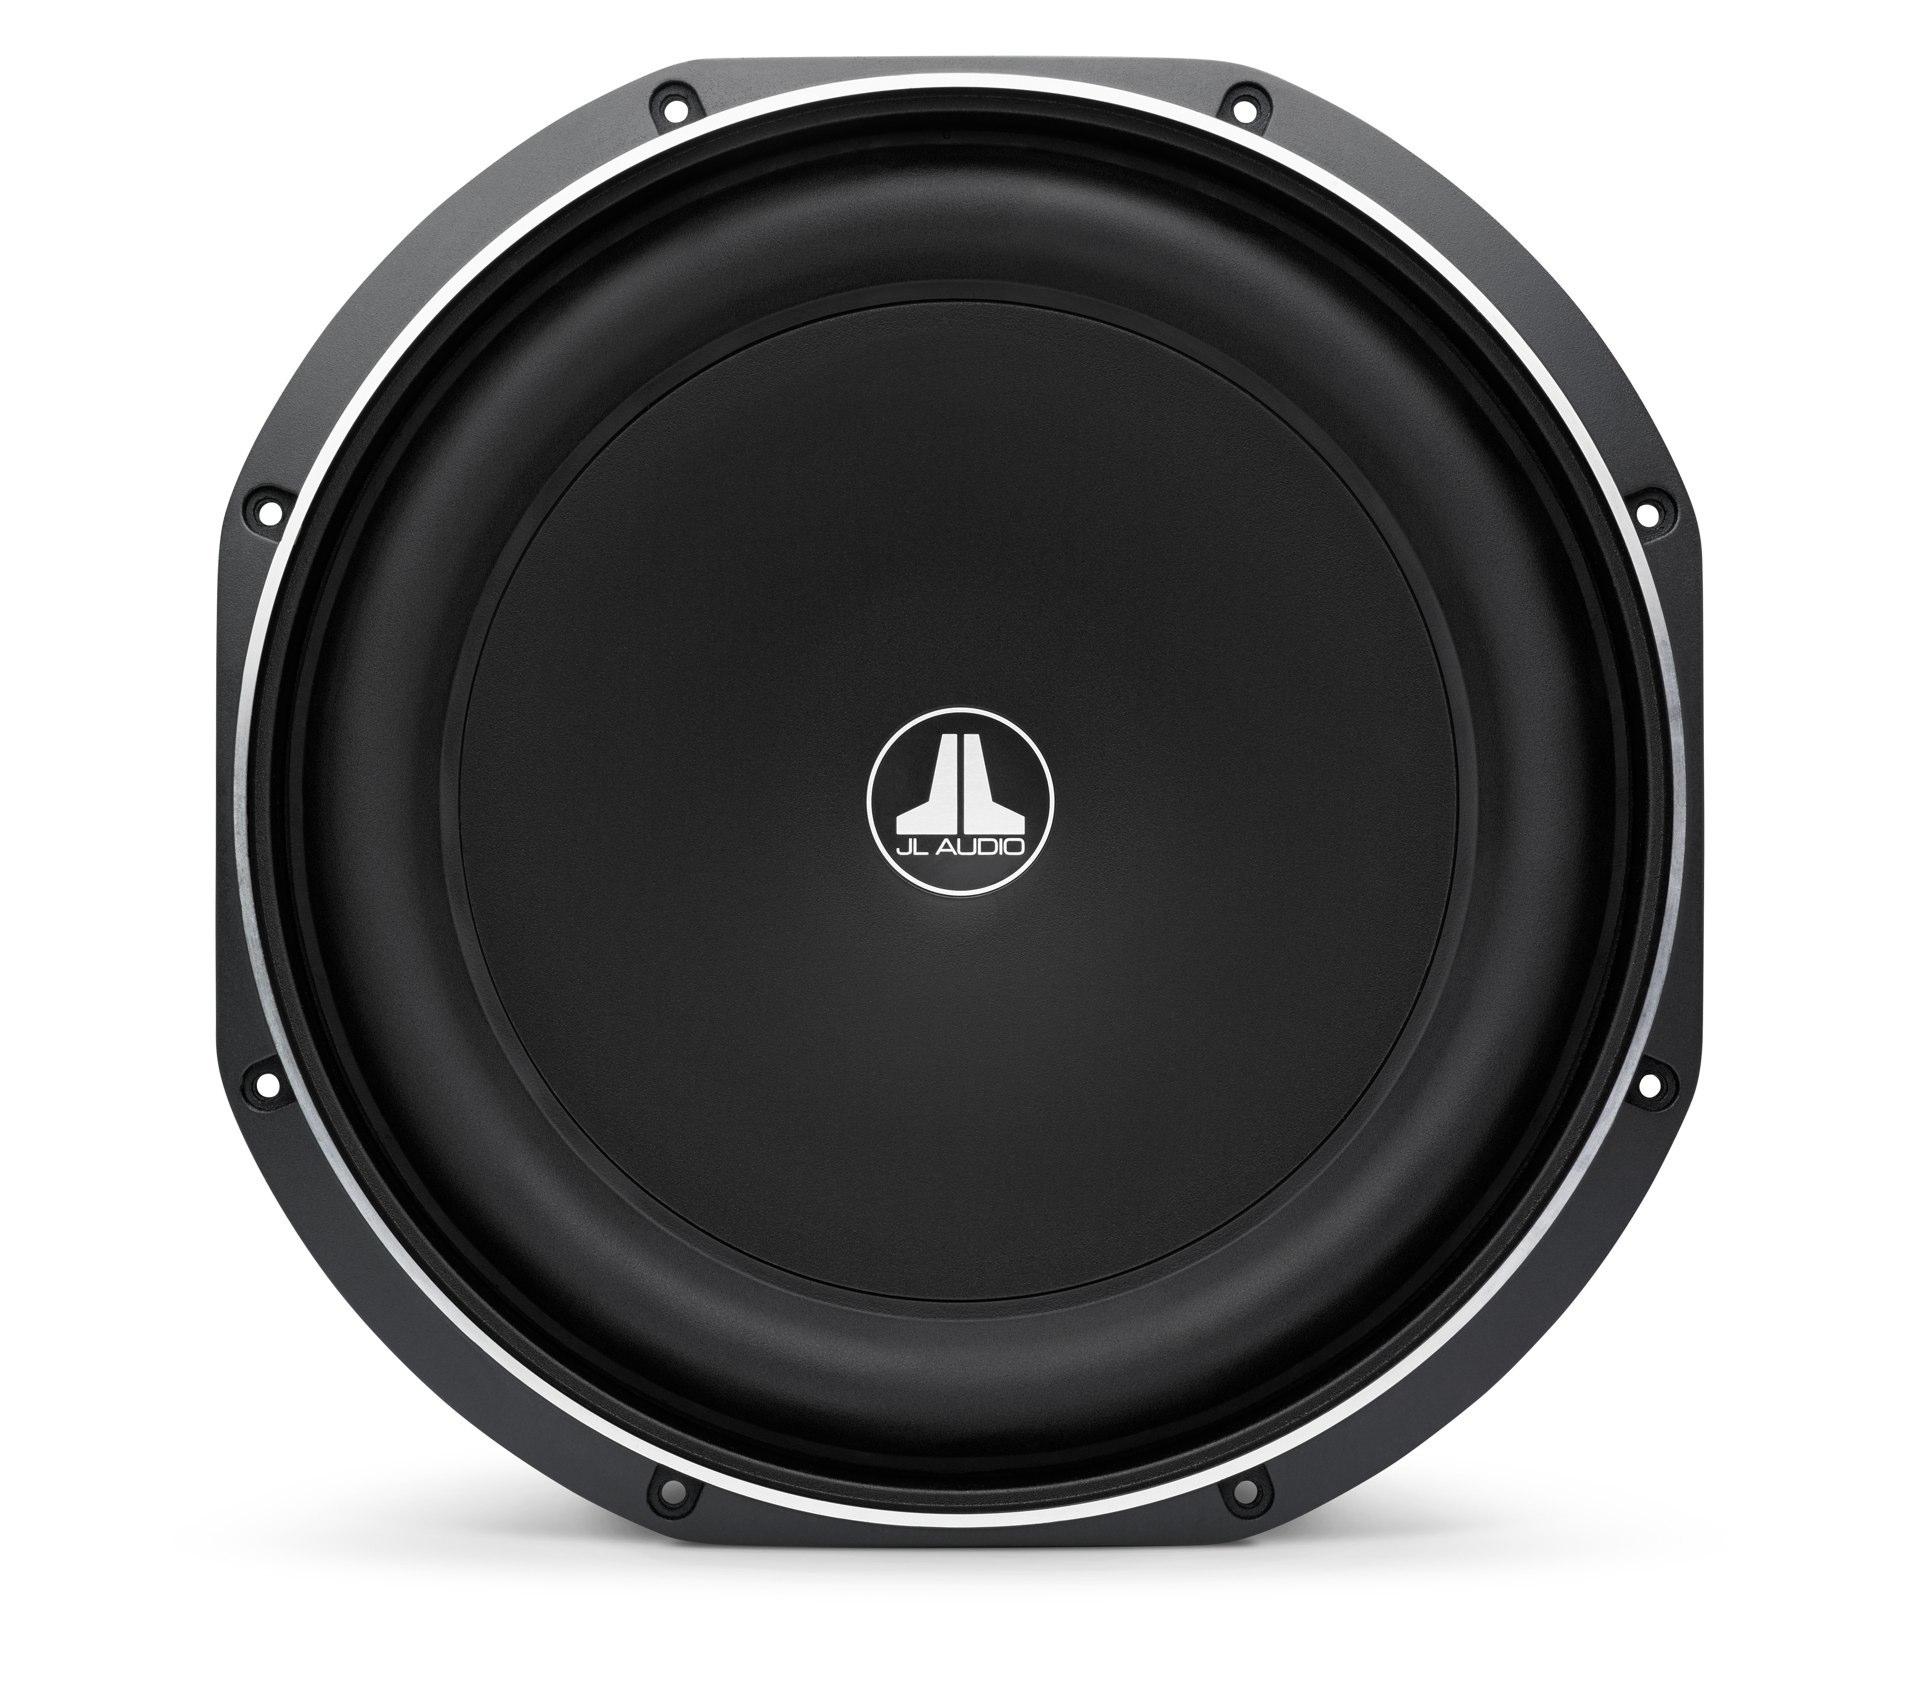 jl audio auto subwoofer flach 300w 2ohm 12tw1 2